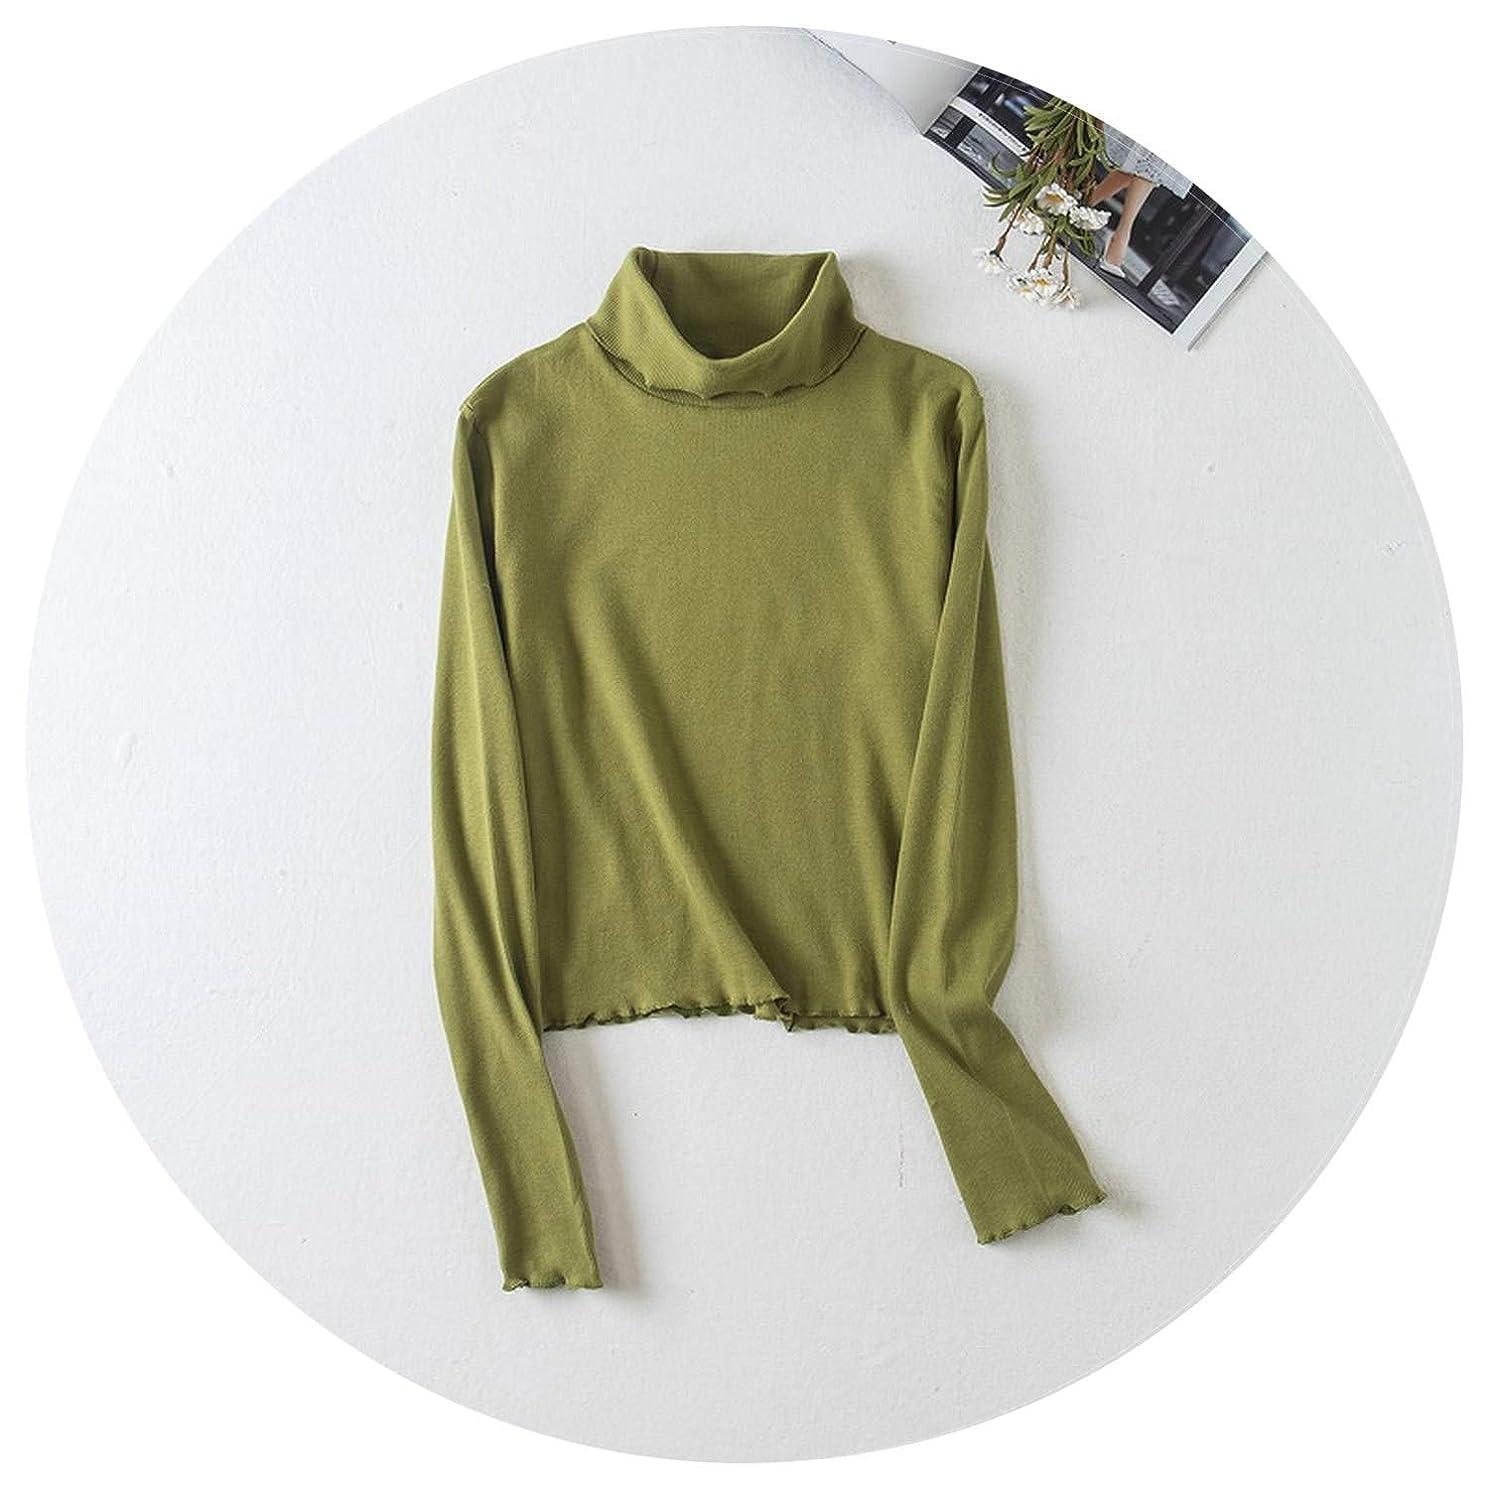 Women Turtleneck Long Sleeve Ruffle Trimming Slim Fit T-Shirt Top